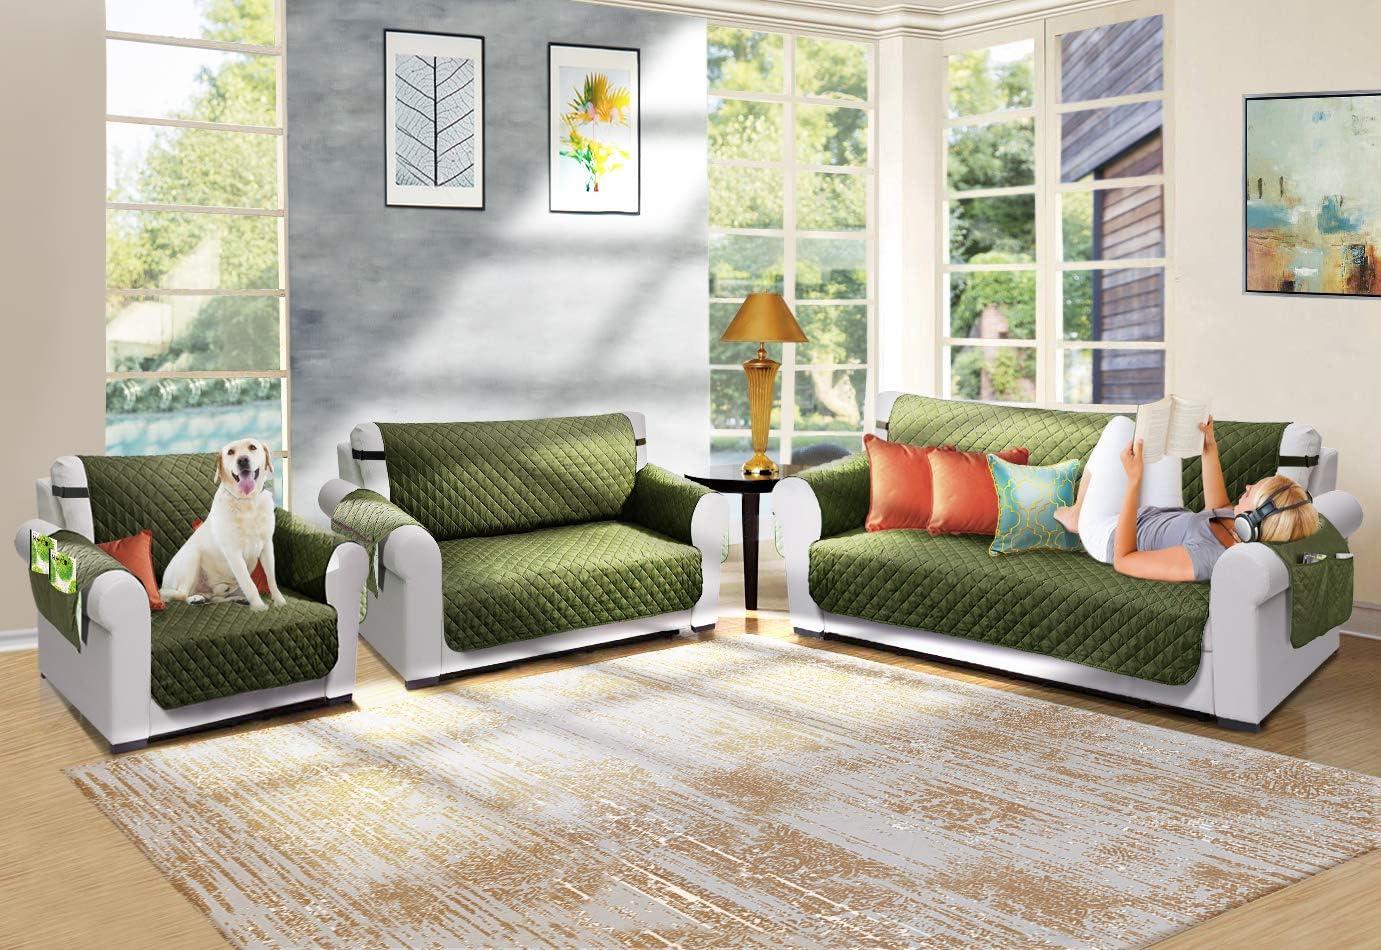 Furniture Protector Loveseat Cover for Dogs Pets Loveseat Slipcover with 2 Strap//Pocket Loveseat:Bottle Green//Beige Vailge Reversible Loveseat Cover Loveseat Covers for Living Room